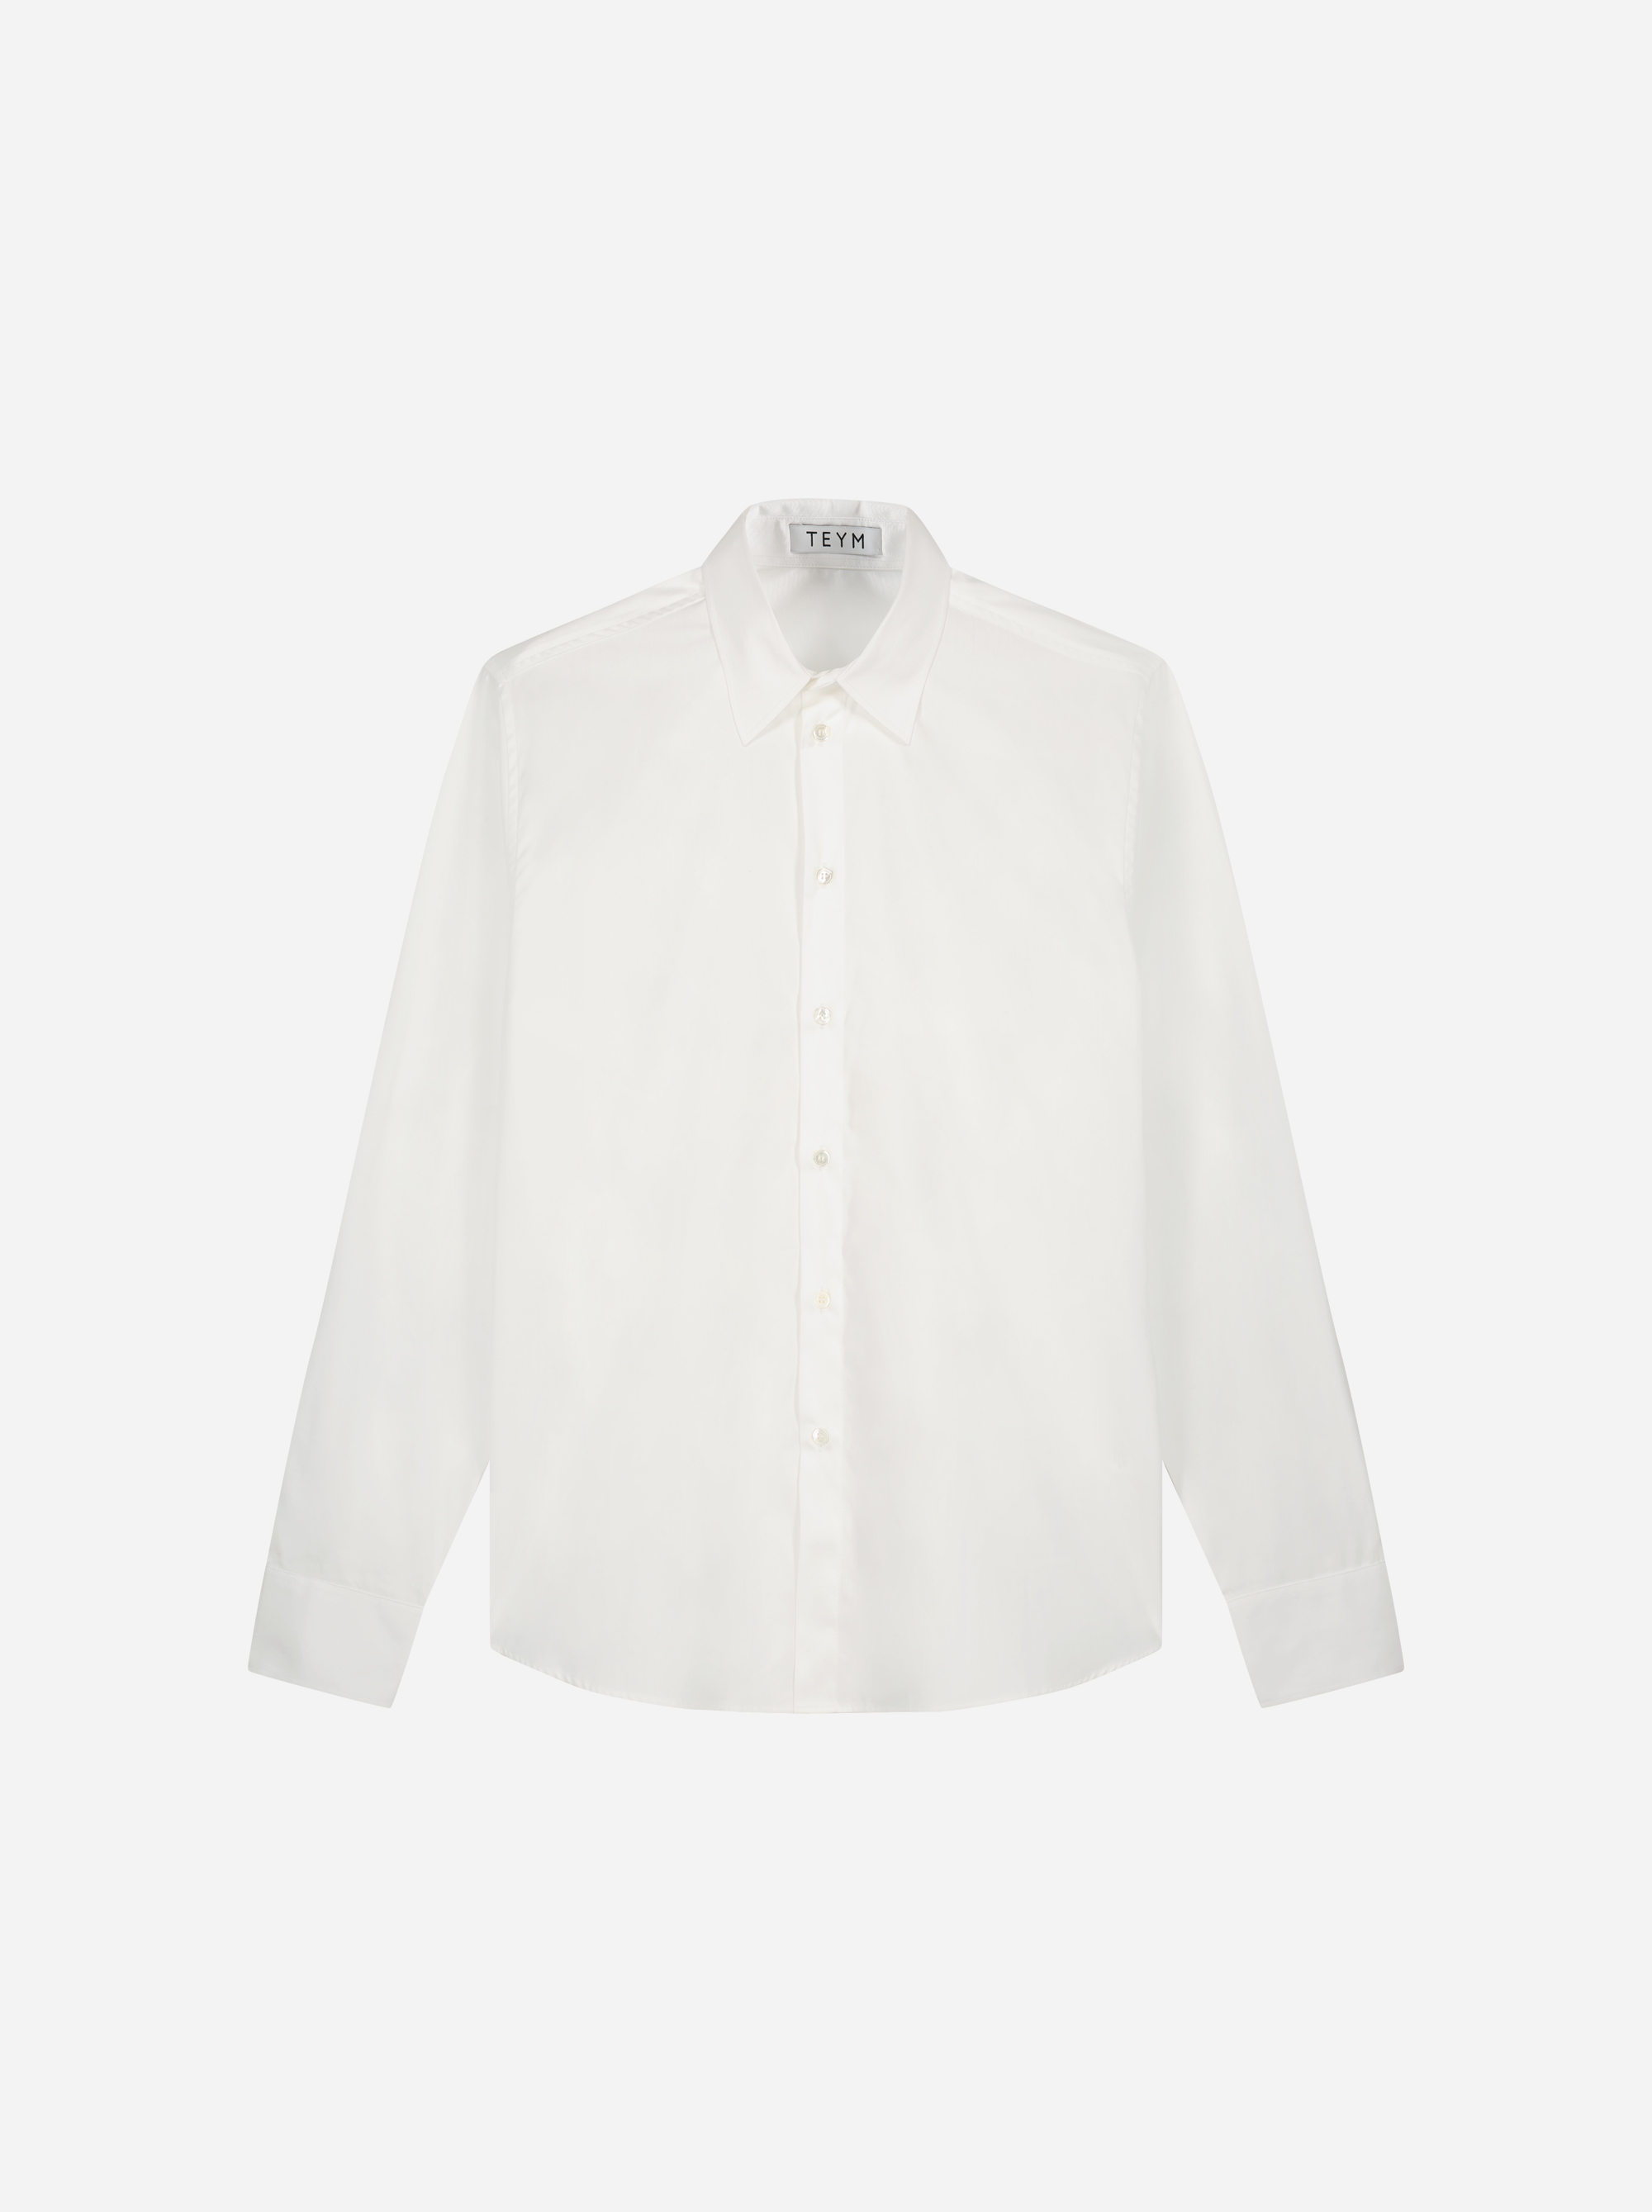 Teym_Shirt_White_Men_front_1B